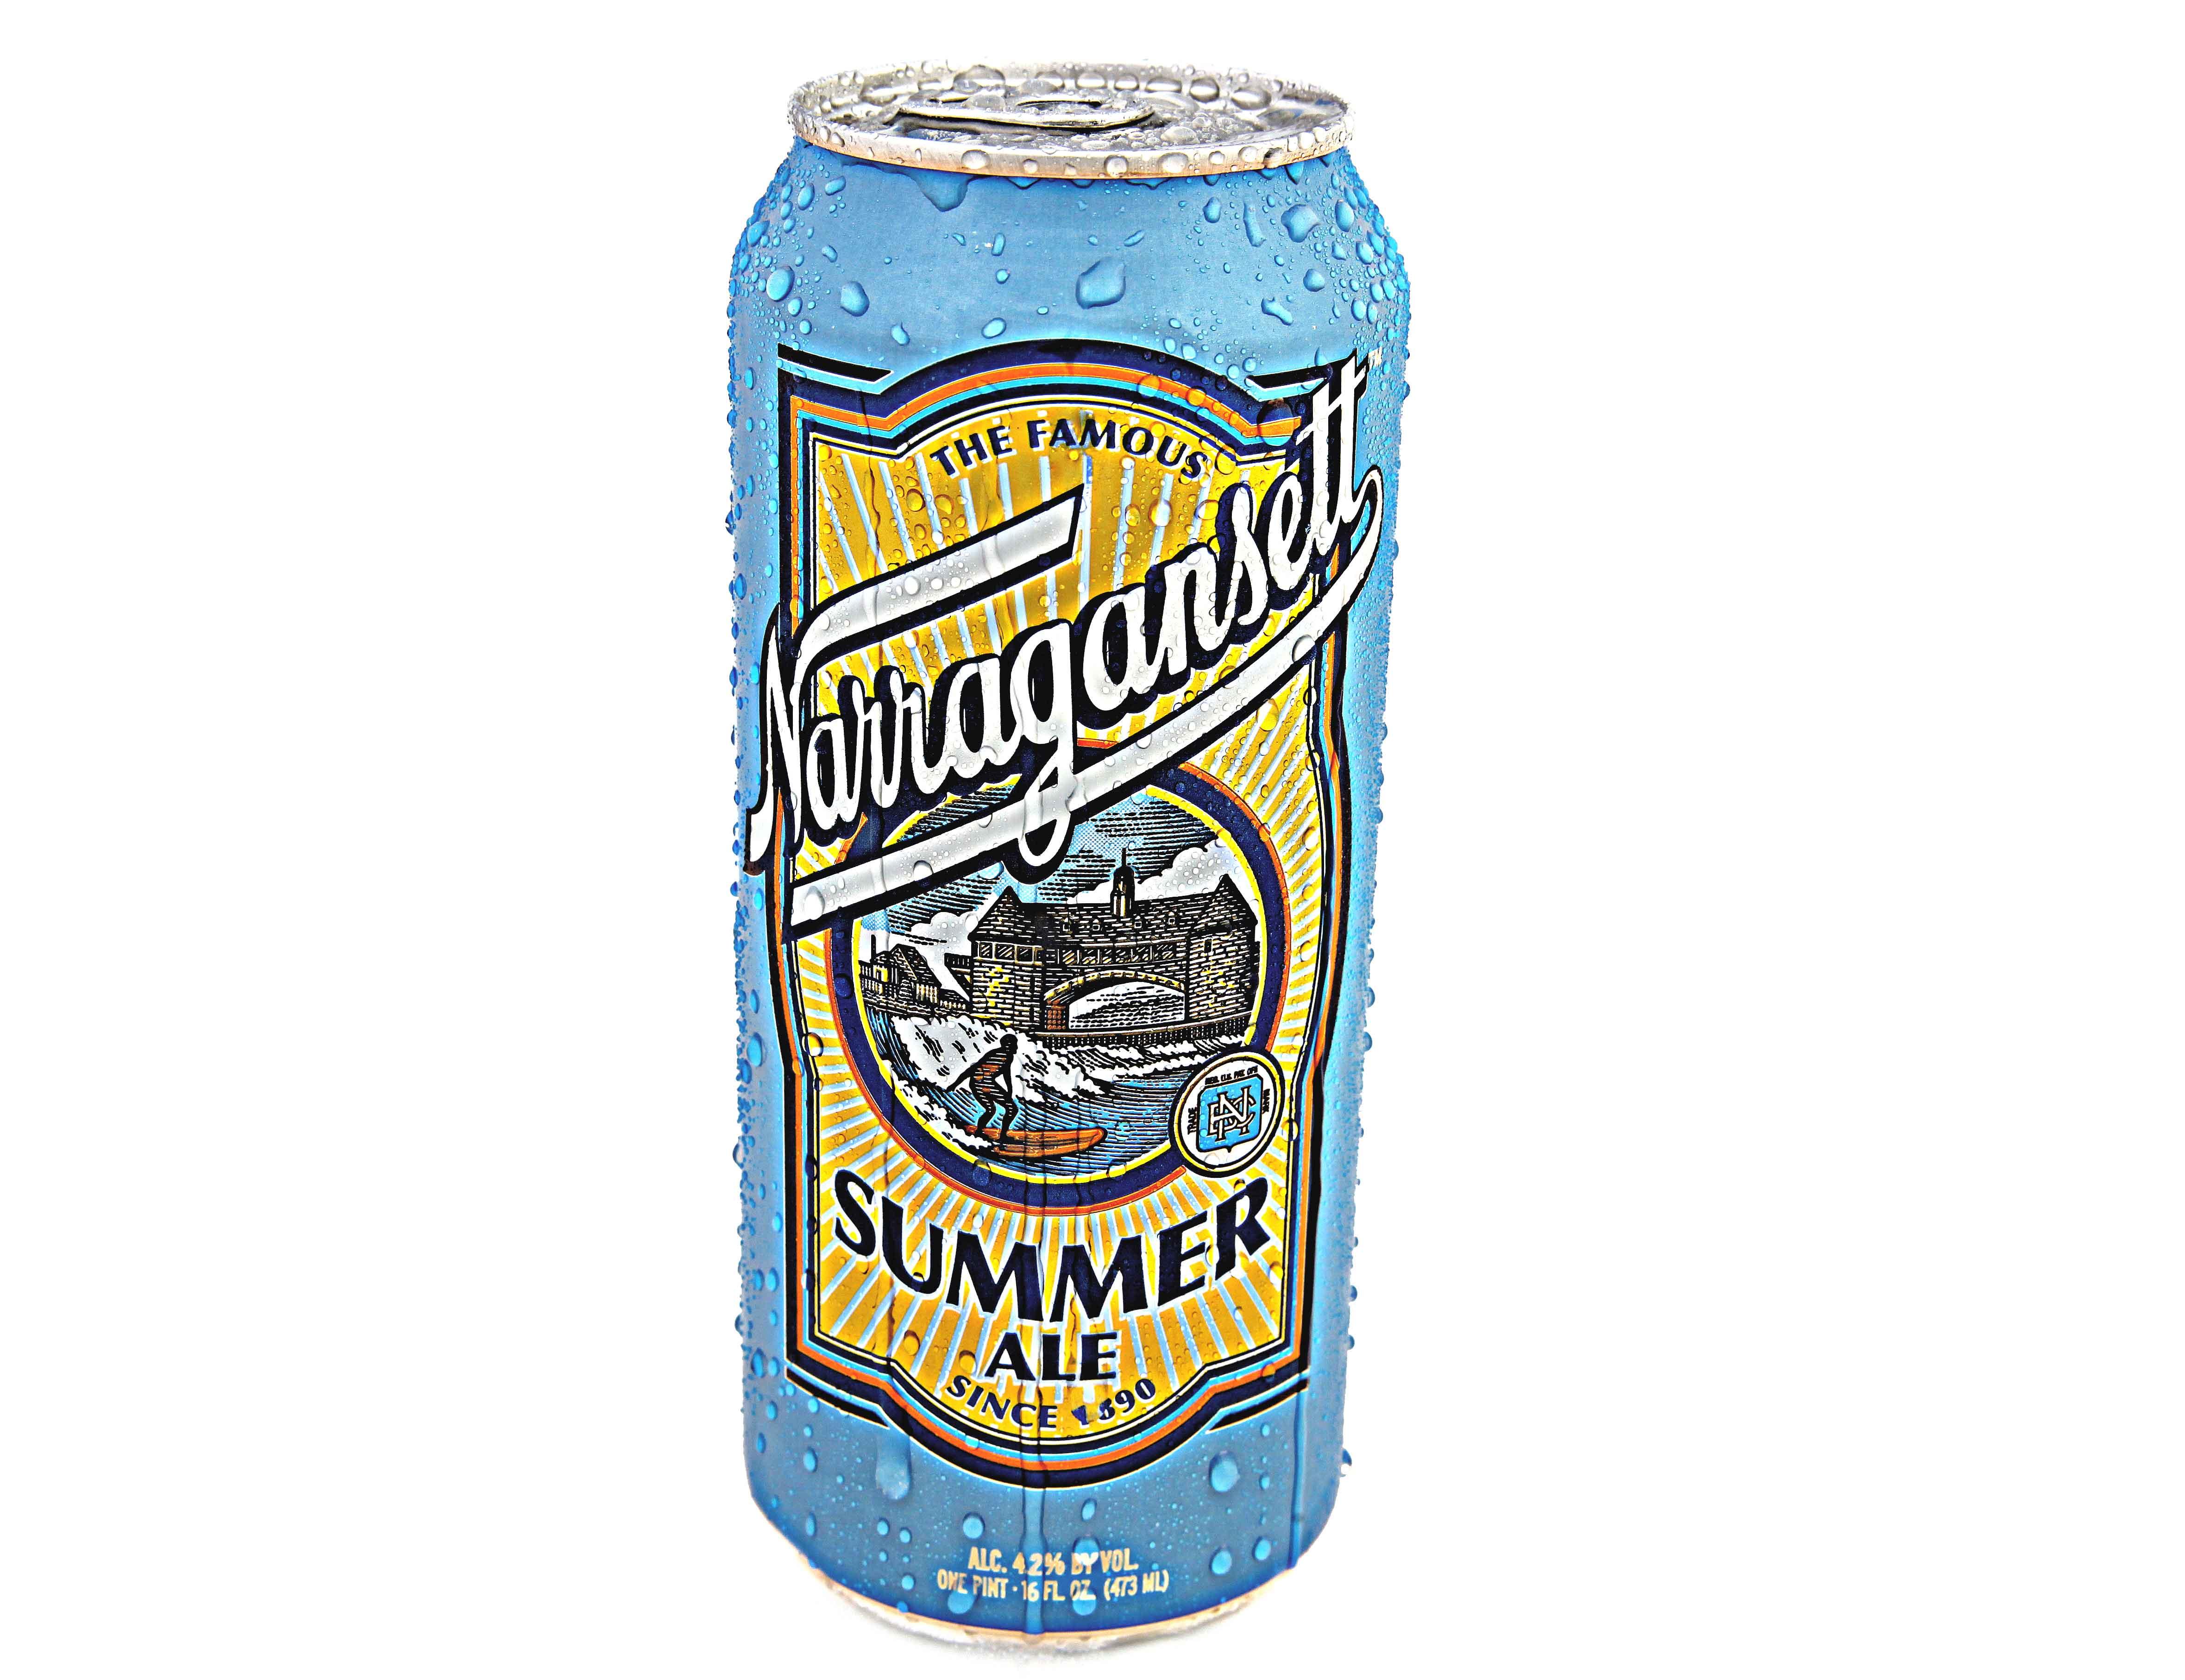 Narragansett Summer Ale Makes Seasonal Return